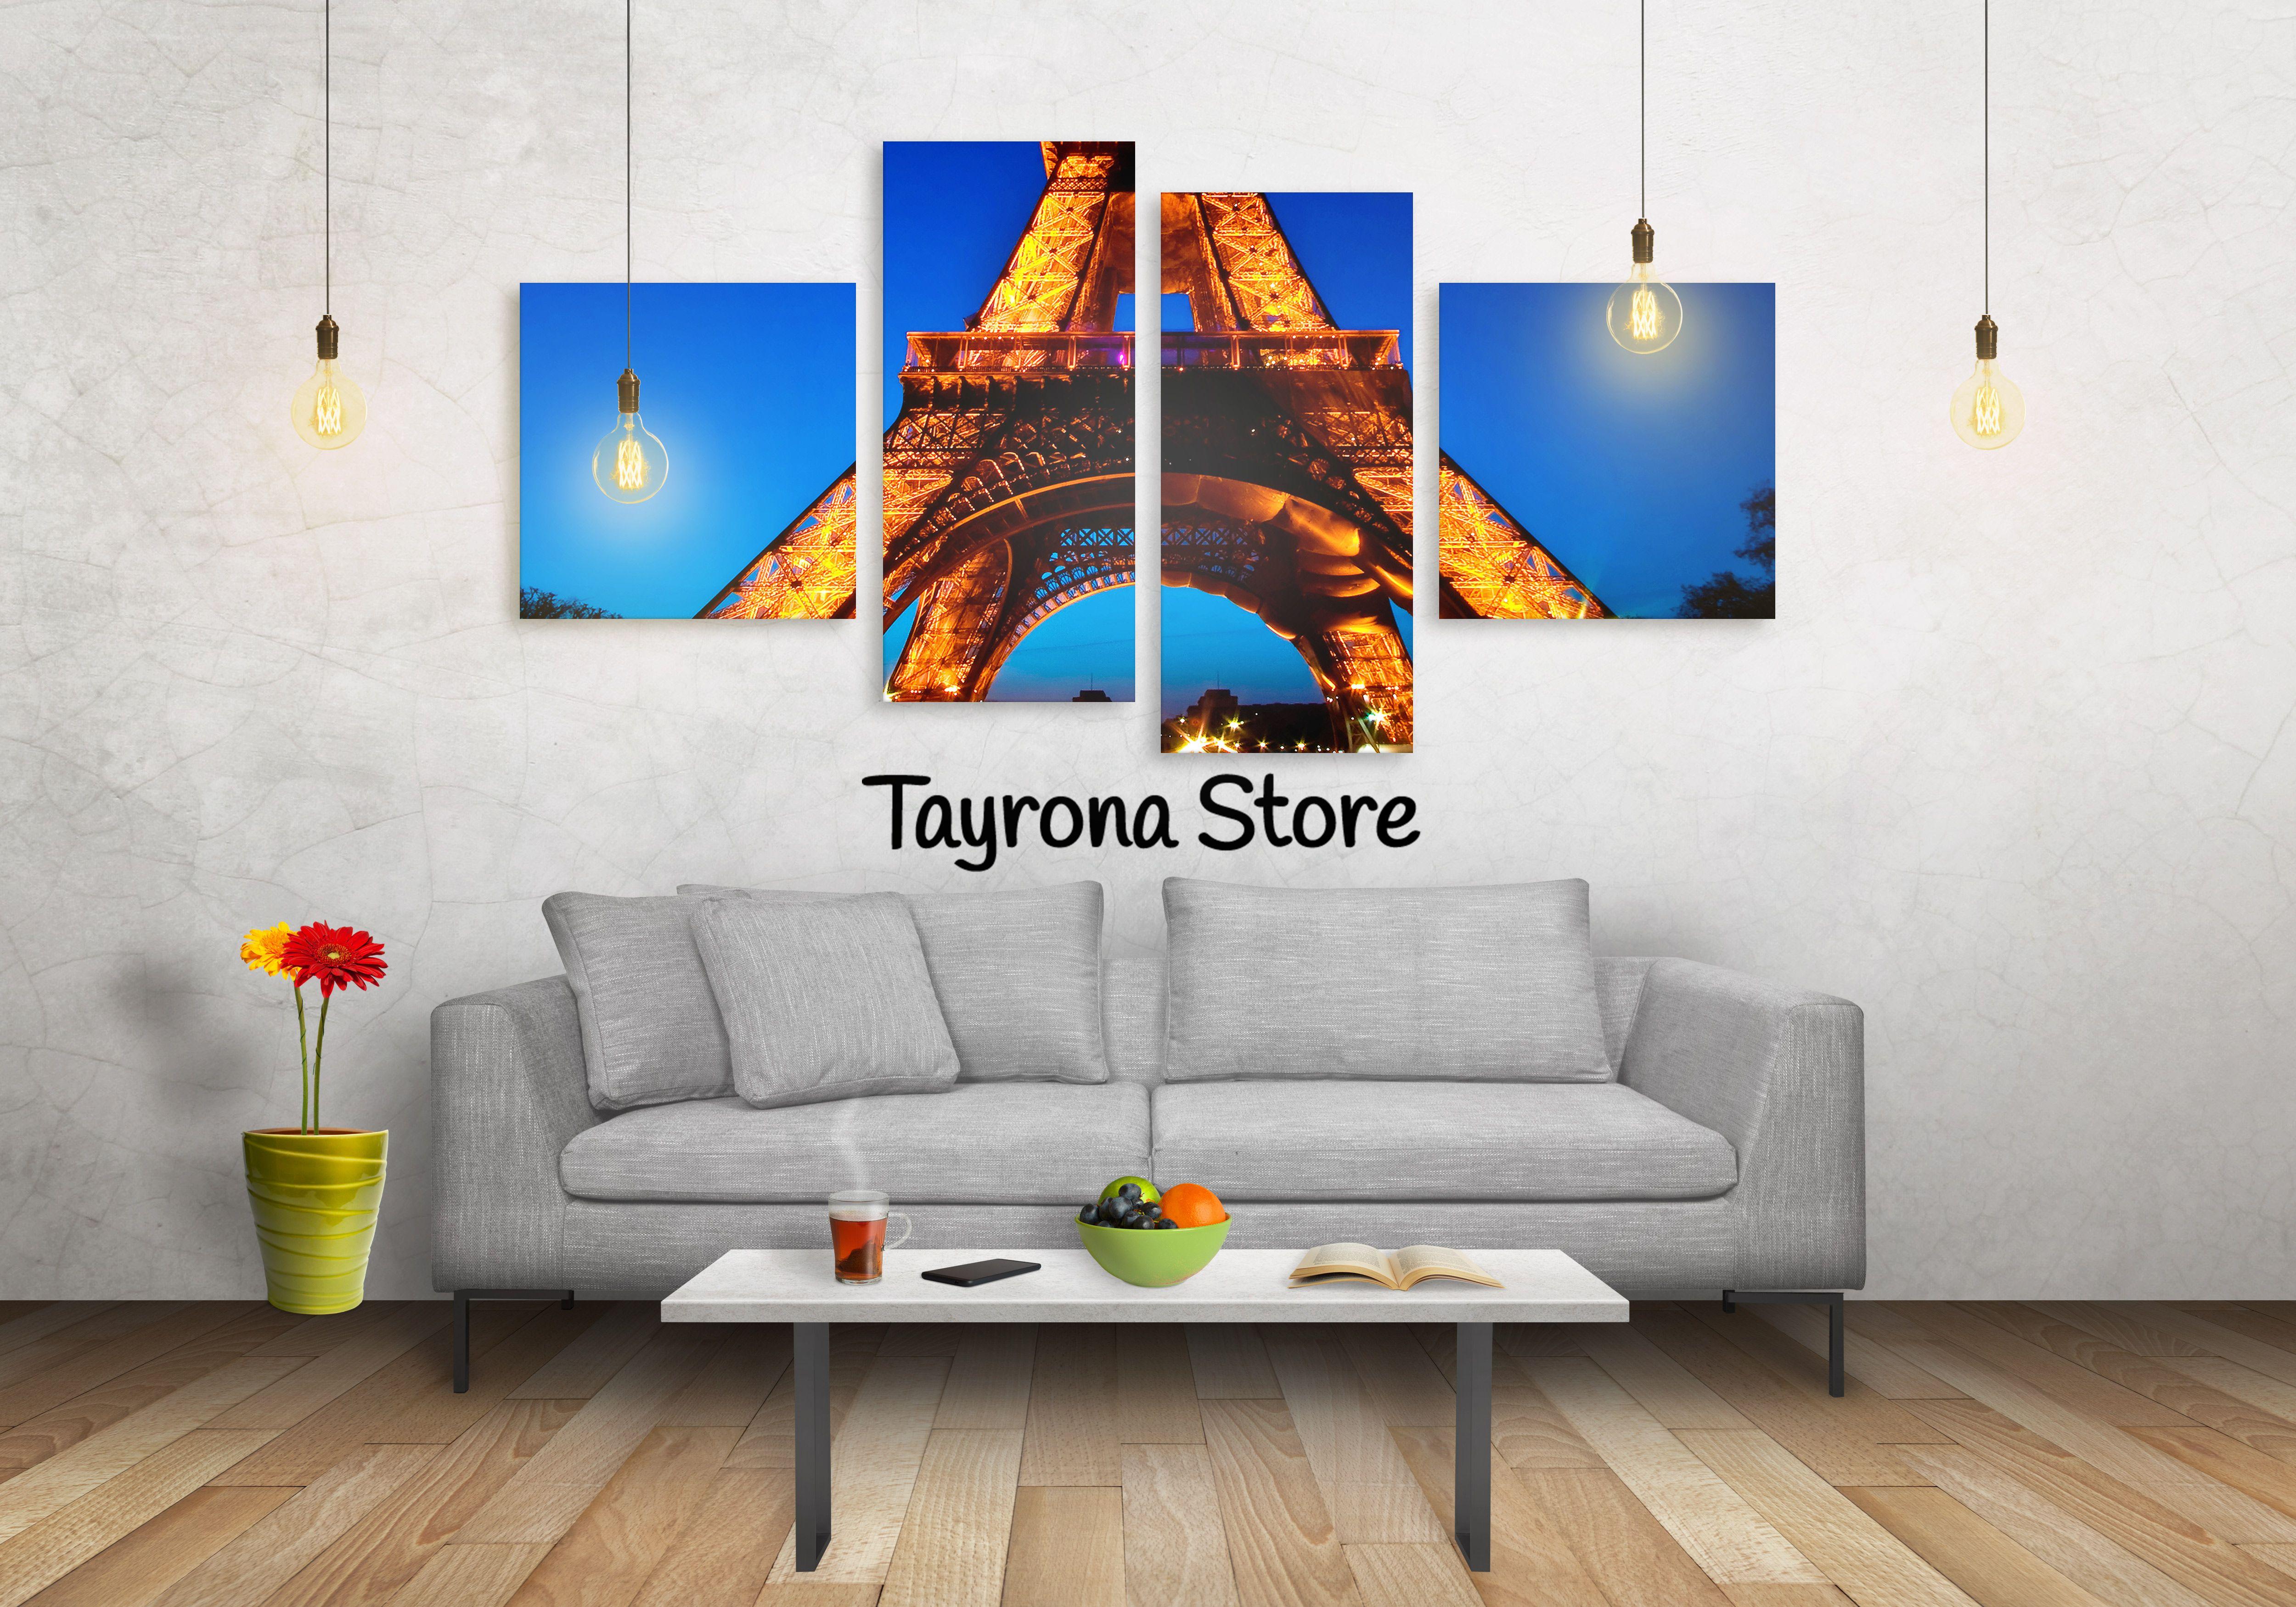 Cuadros Decorativos Paris-Torre-Eiffel-18 #tayronastore,#cuadros ...